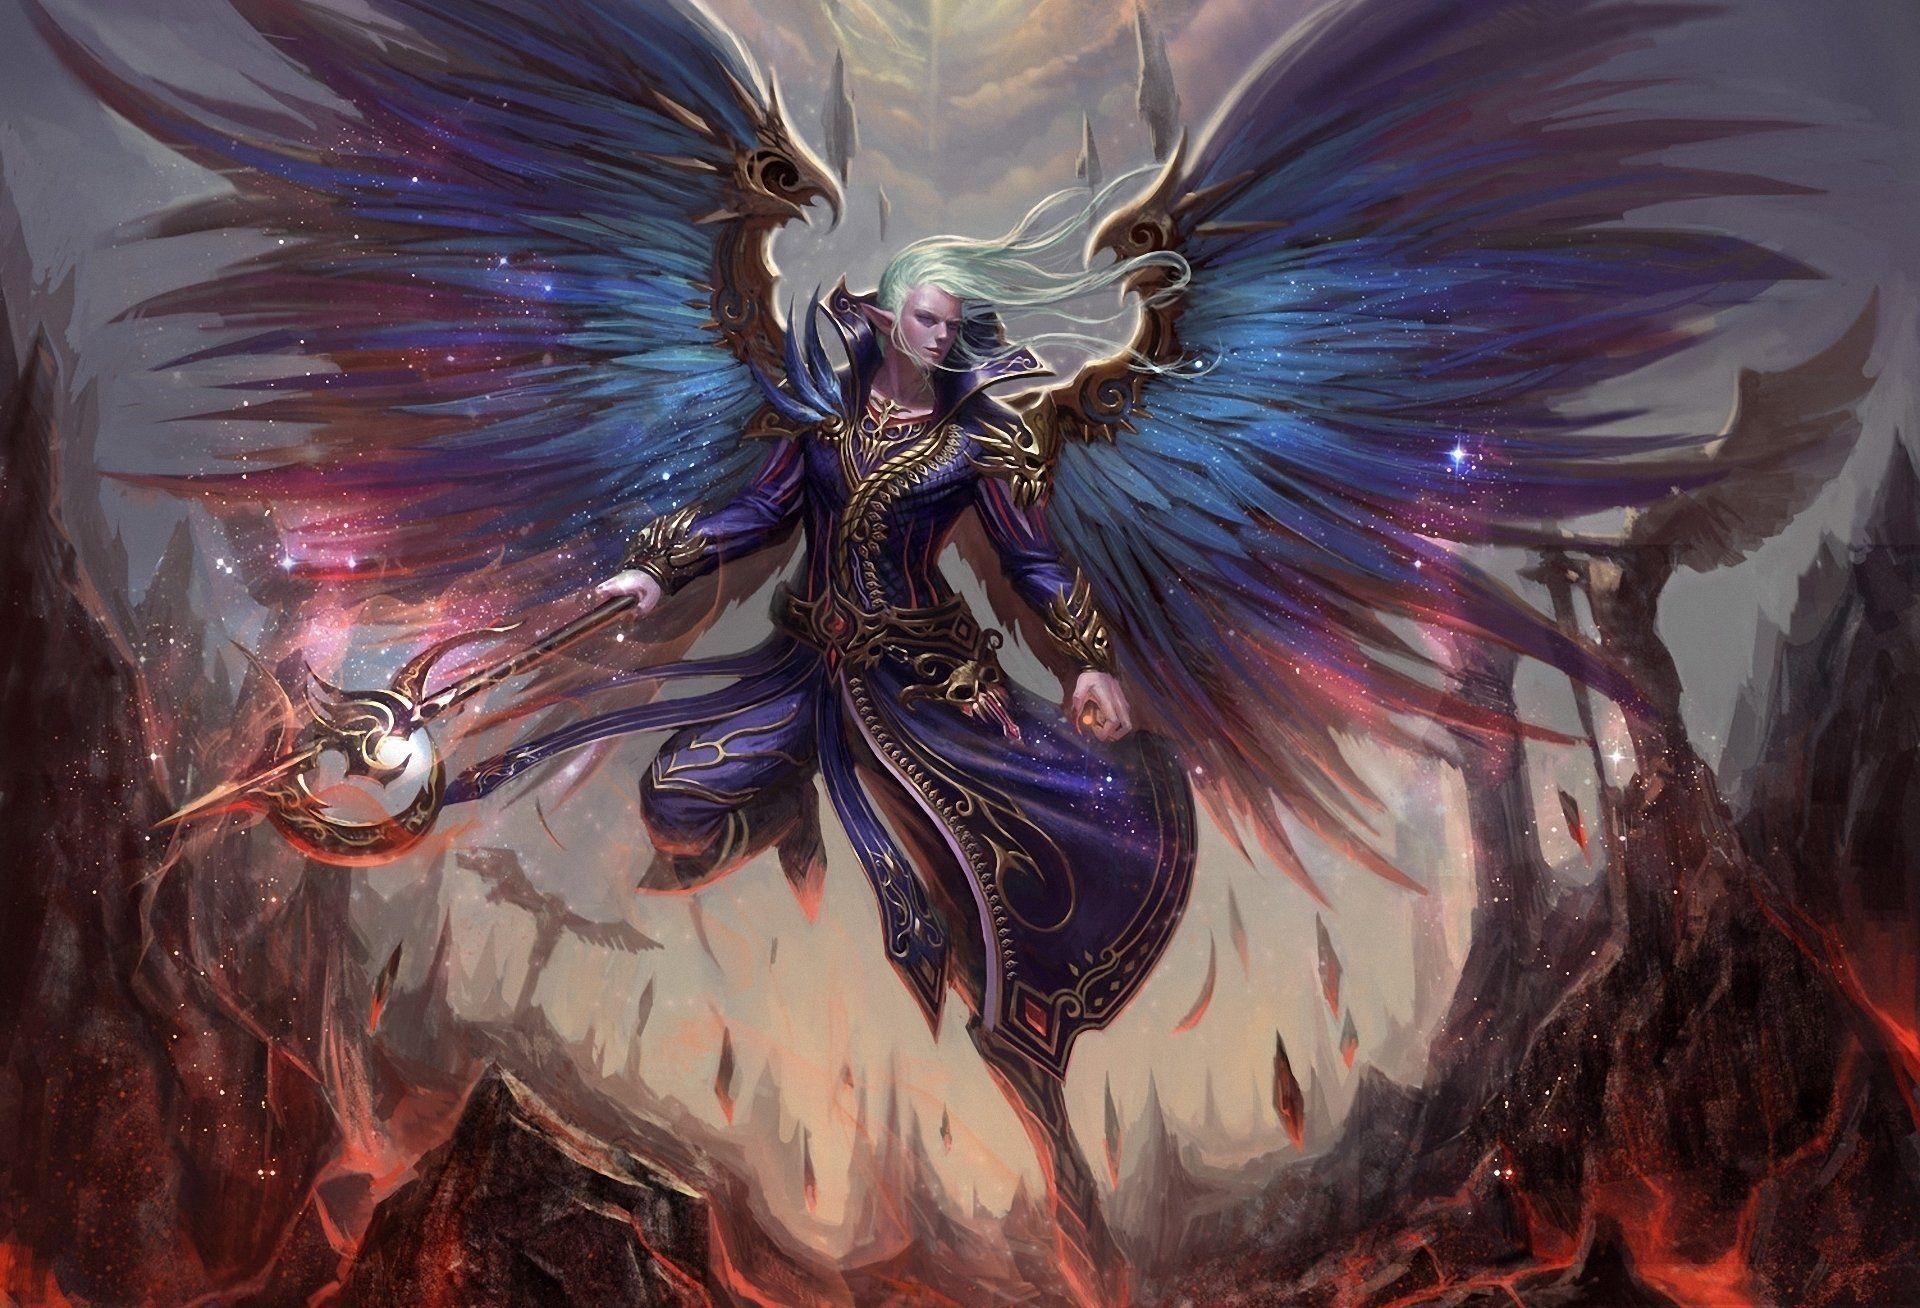 208 Angel Warrior Hd Wallpapers Backgrounds Wallpaper Abyss Warriors Wallpaper Angel Warrior Angel Art Anime male angel wallpaper